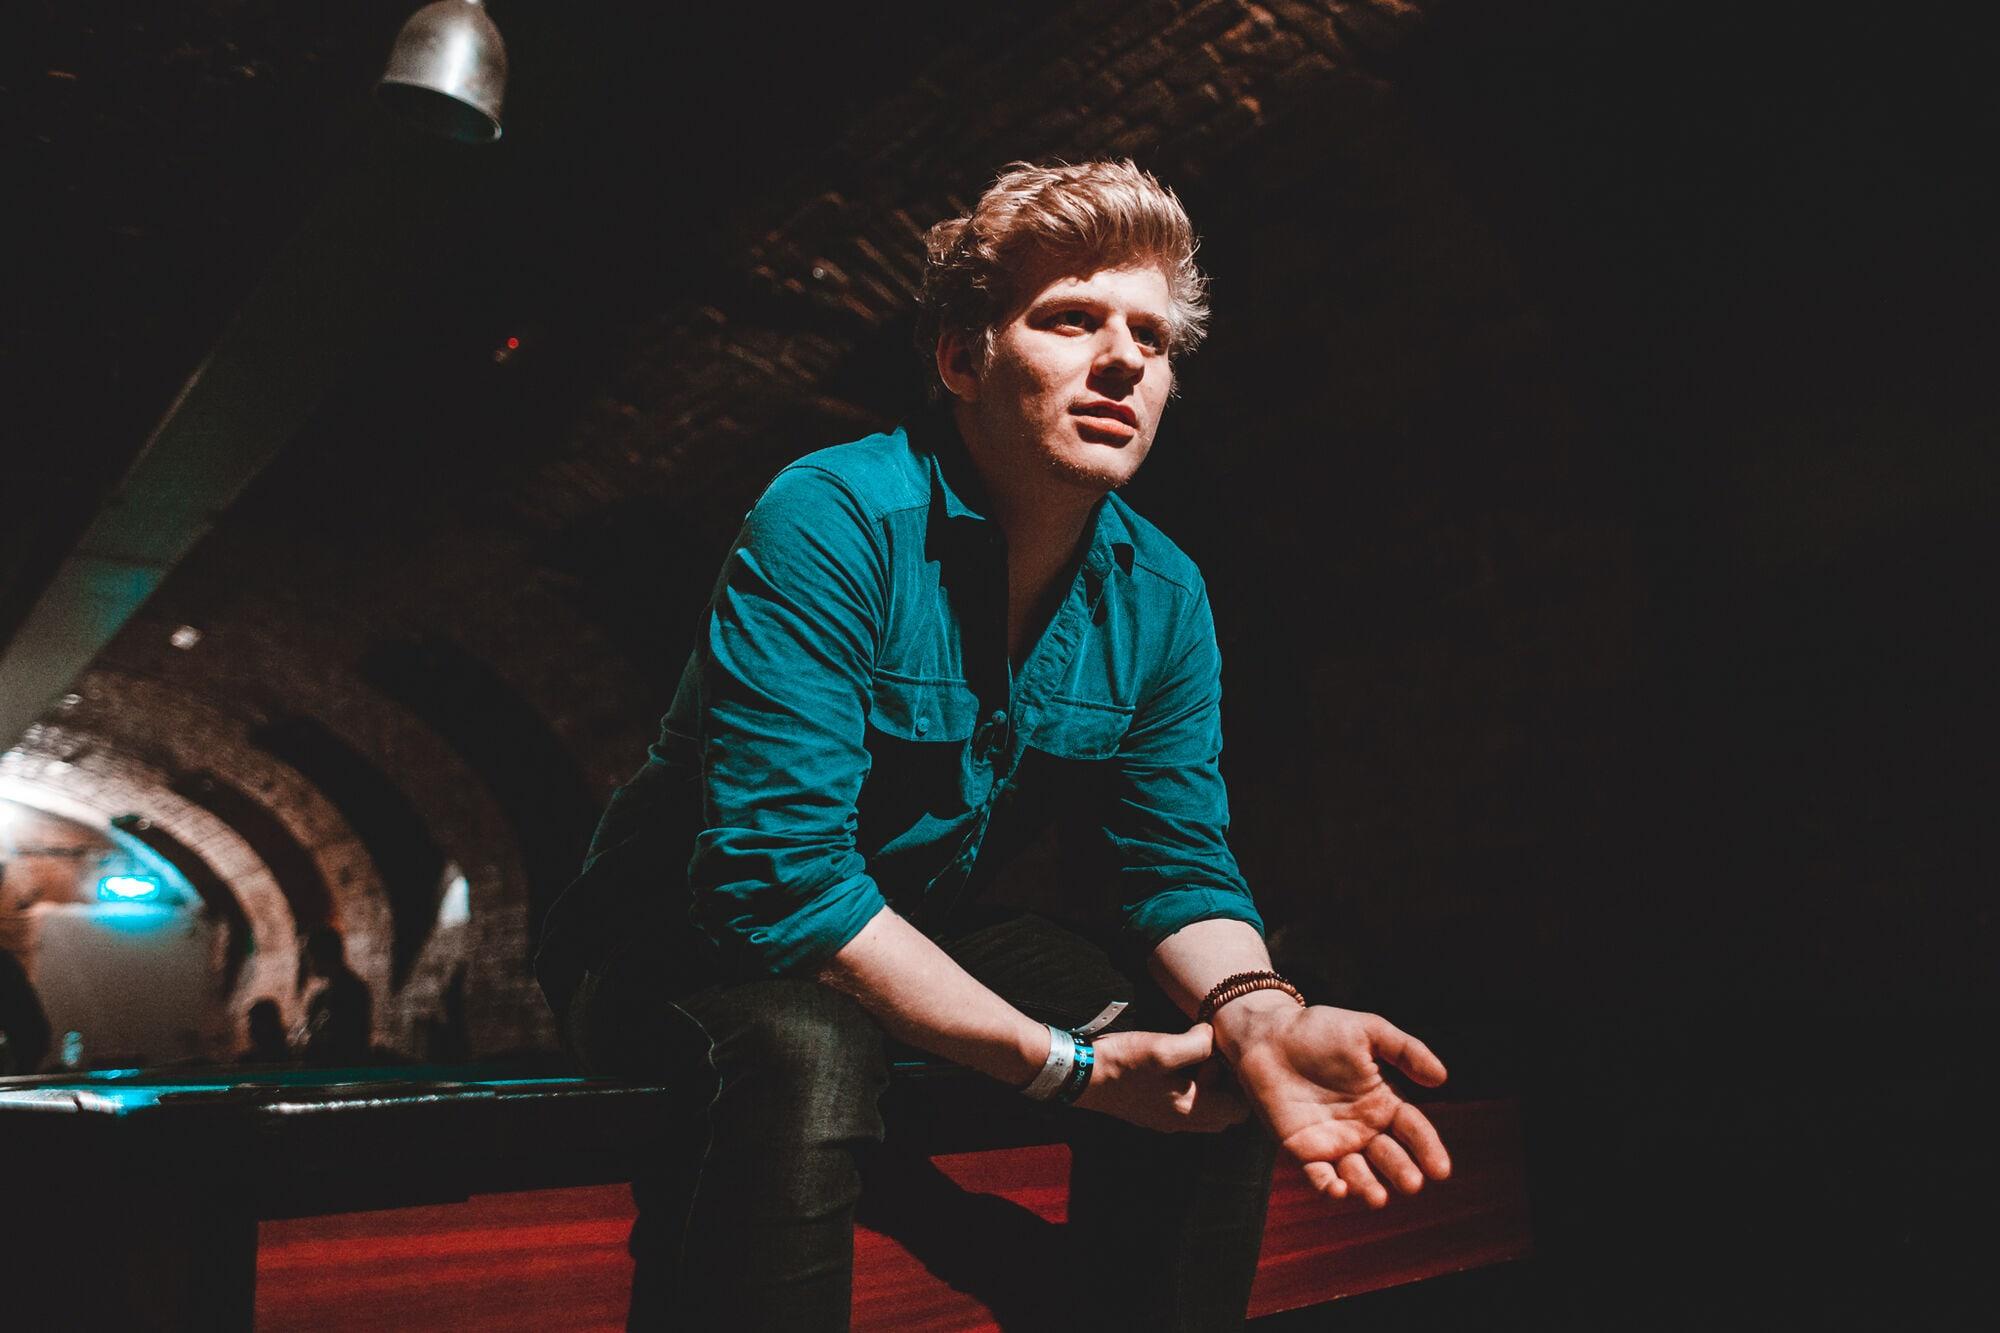 Thorsteinn Einarsson3